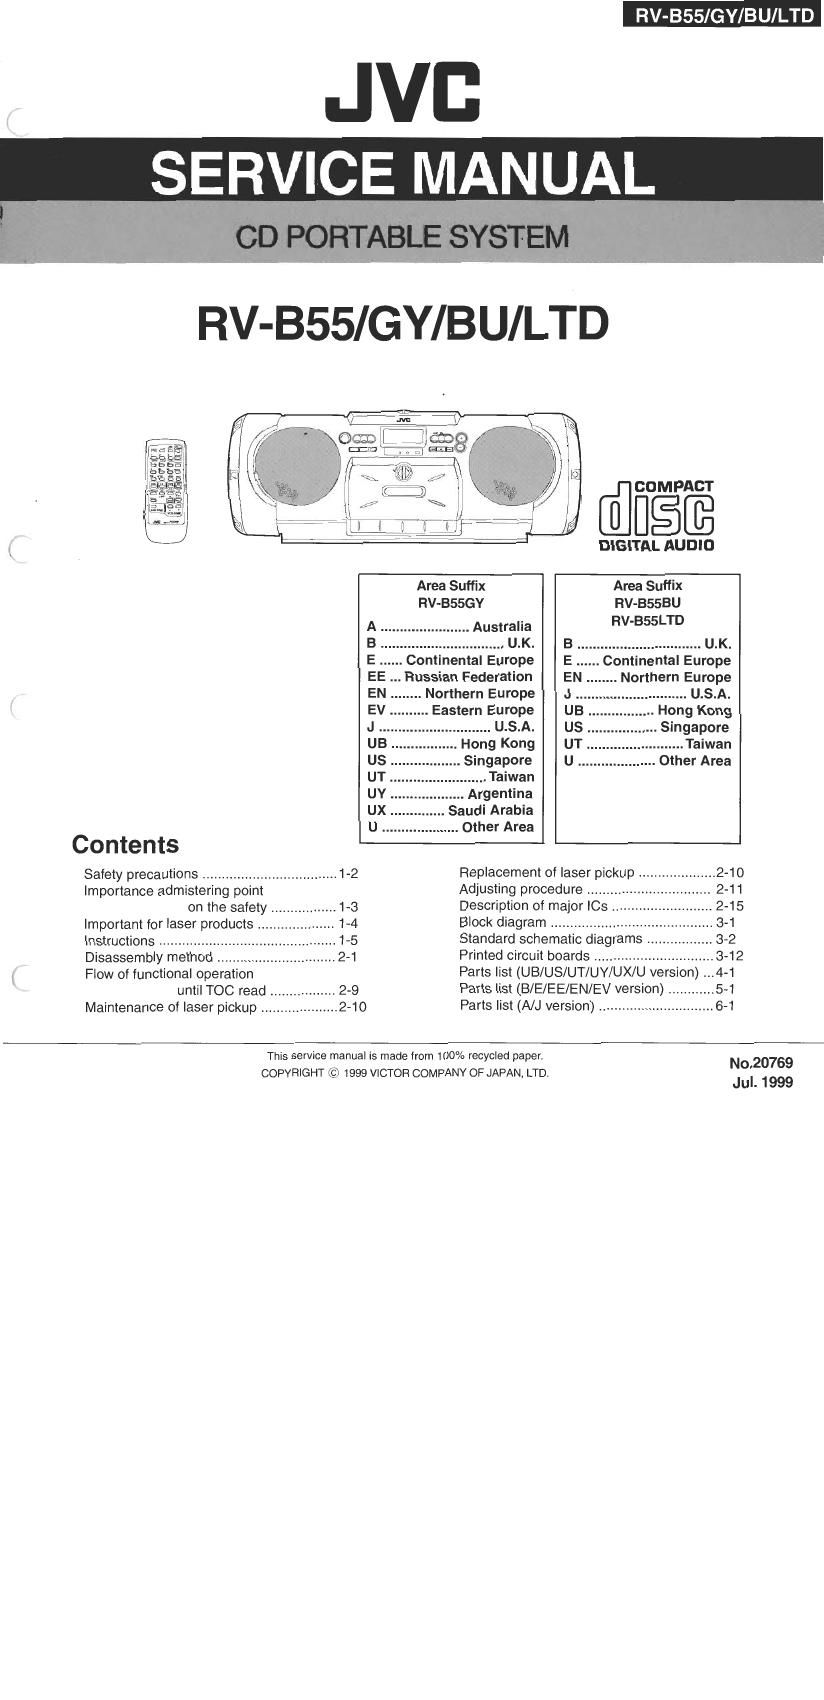 Free download Jvc UX 1500 RGR Service Manual